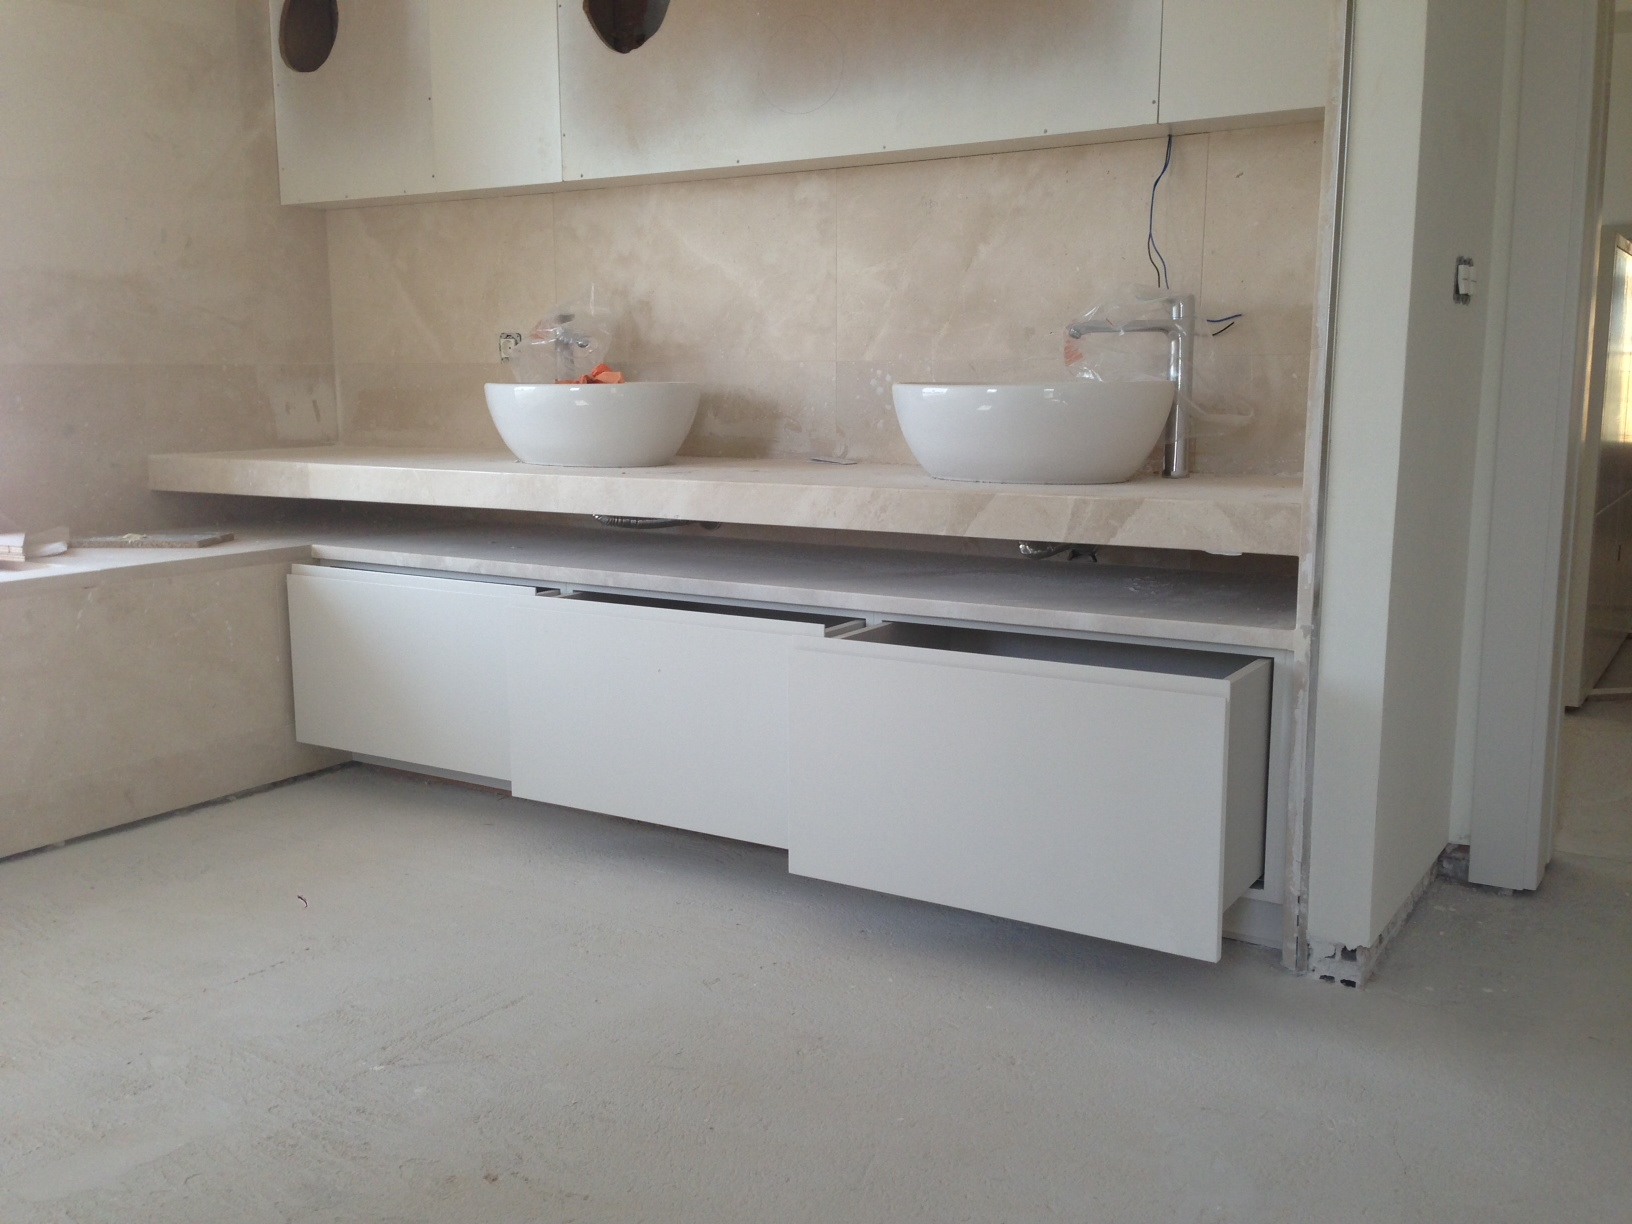 Baño De Diseño | Mueble Bano Diseno Carpinteria Ebanisteria Mariano Montes